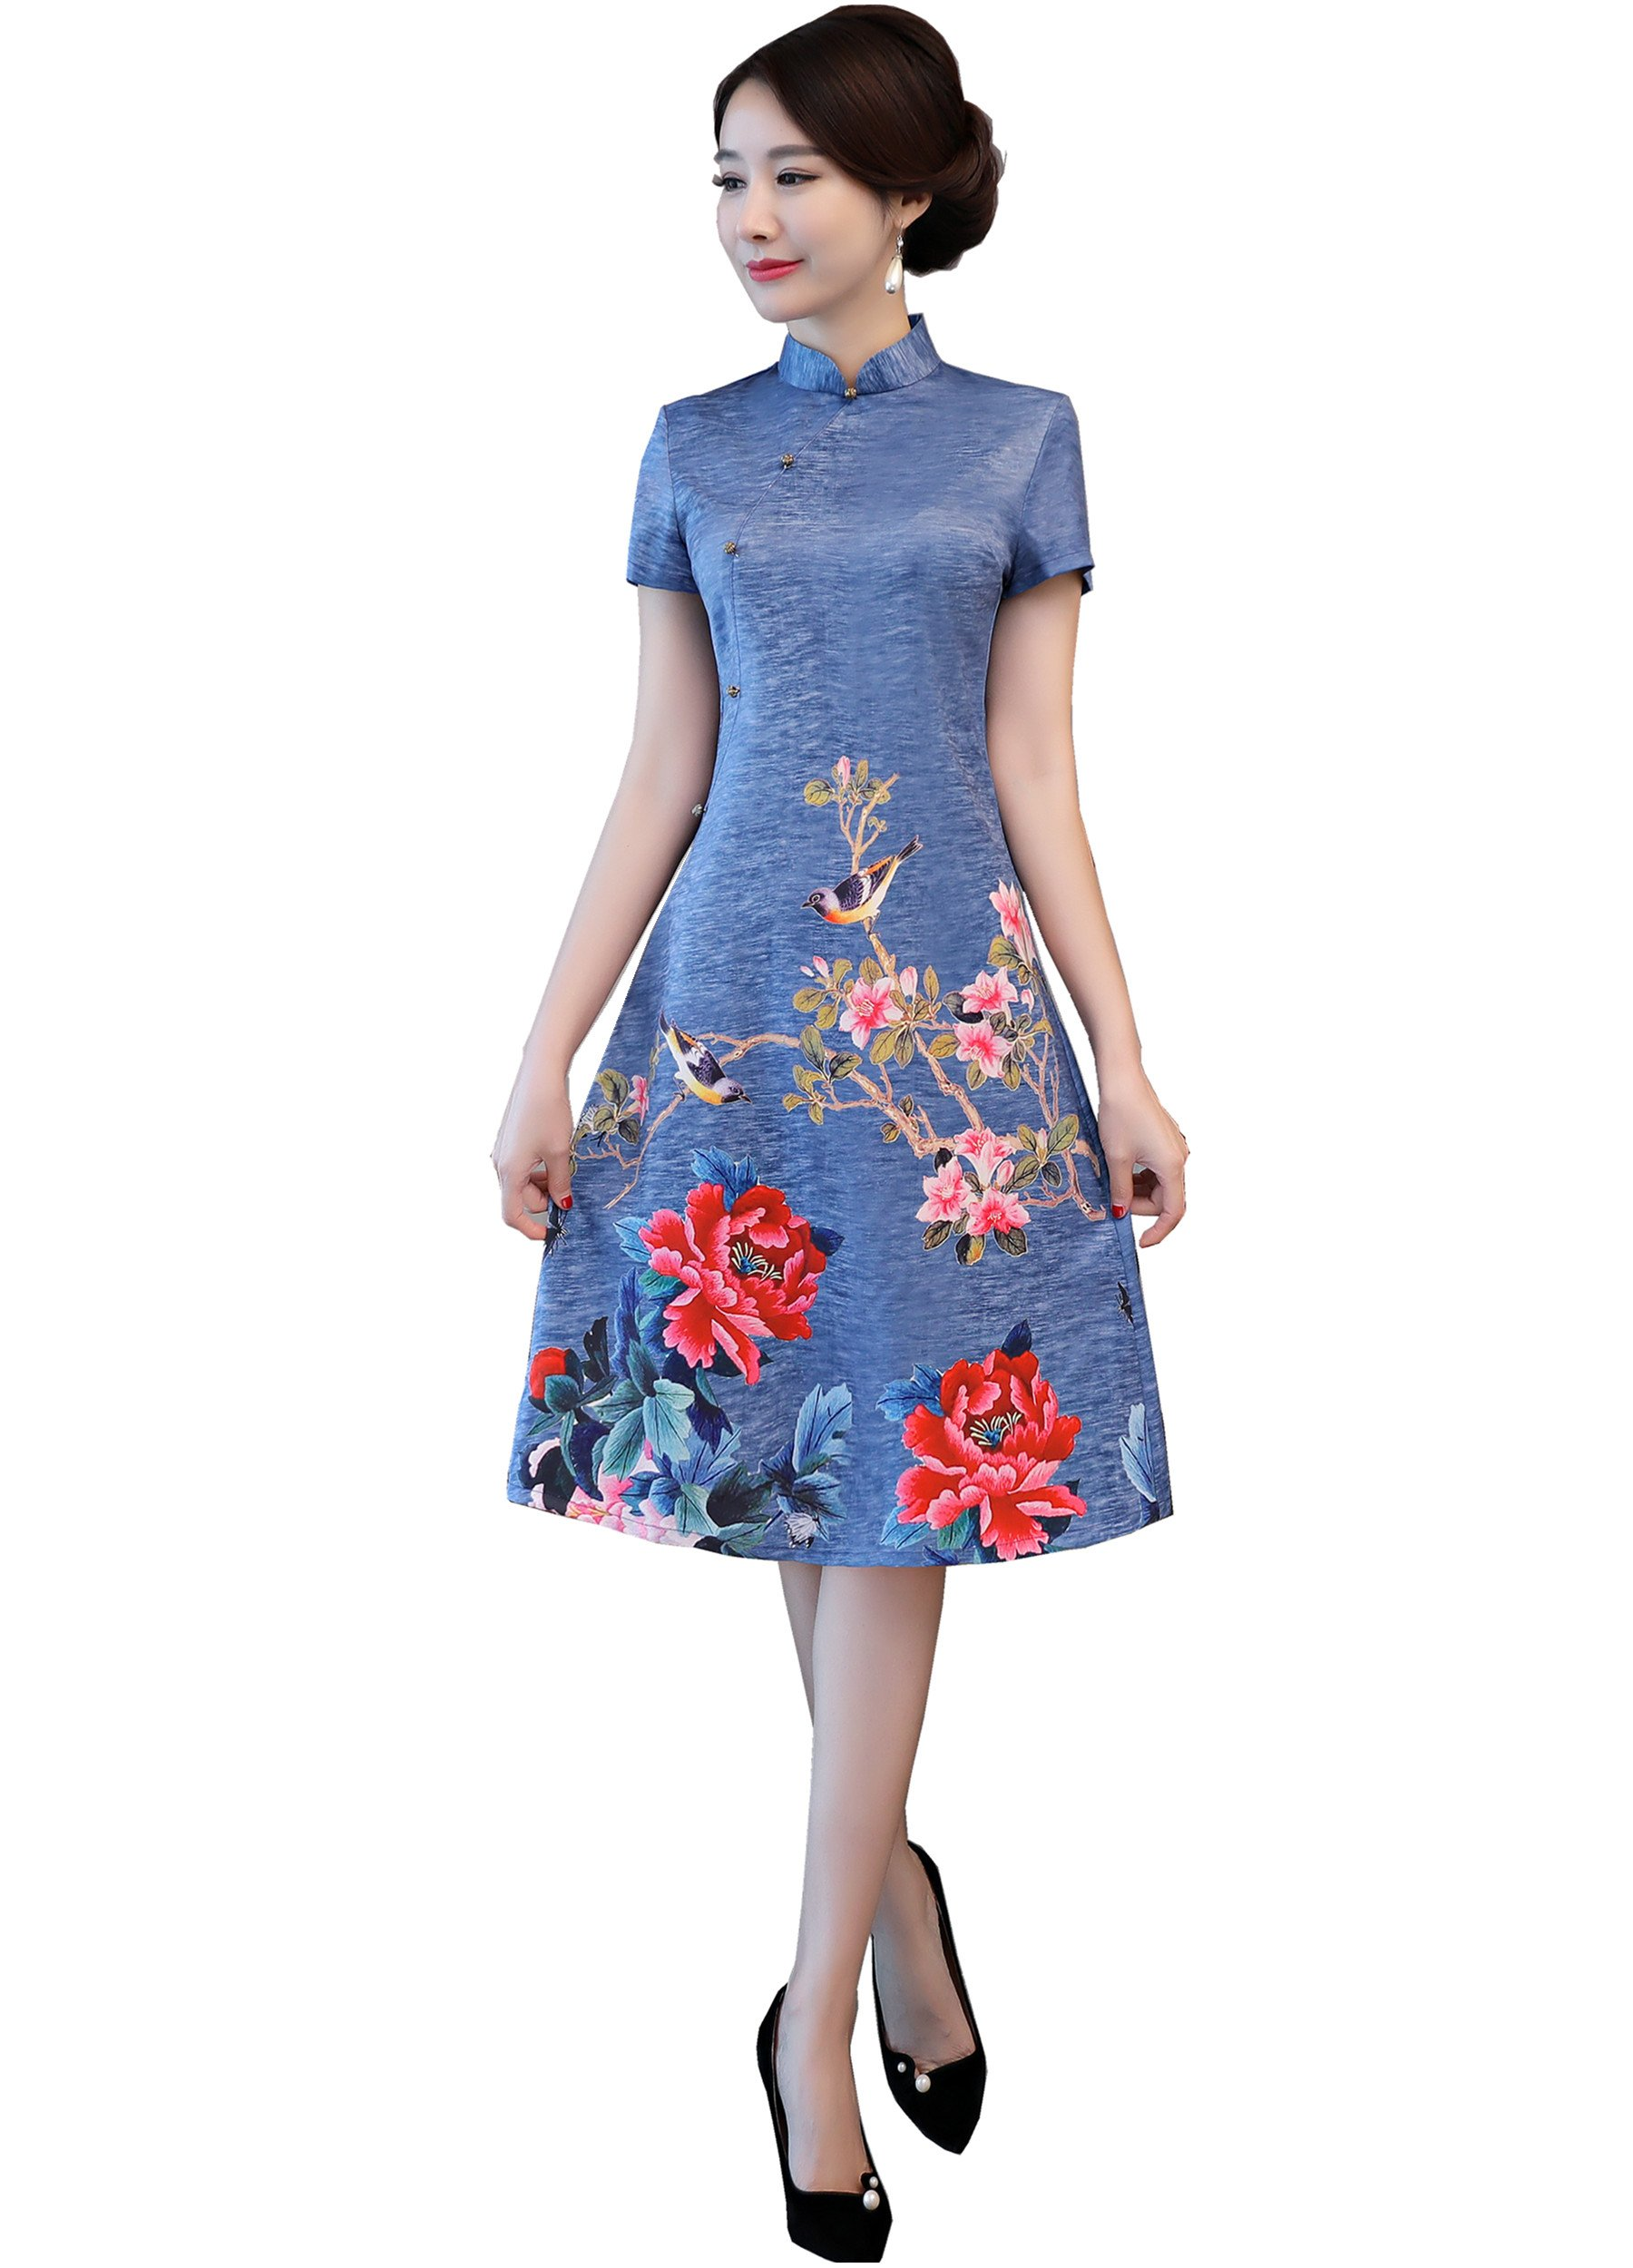 Shanghai Story Knee Length Floral Cheongsam Chinese Traditional Dress 3XL Blue